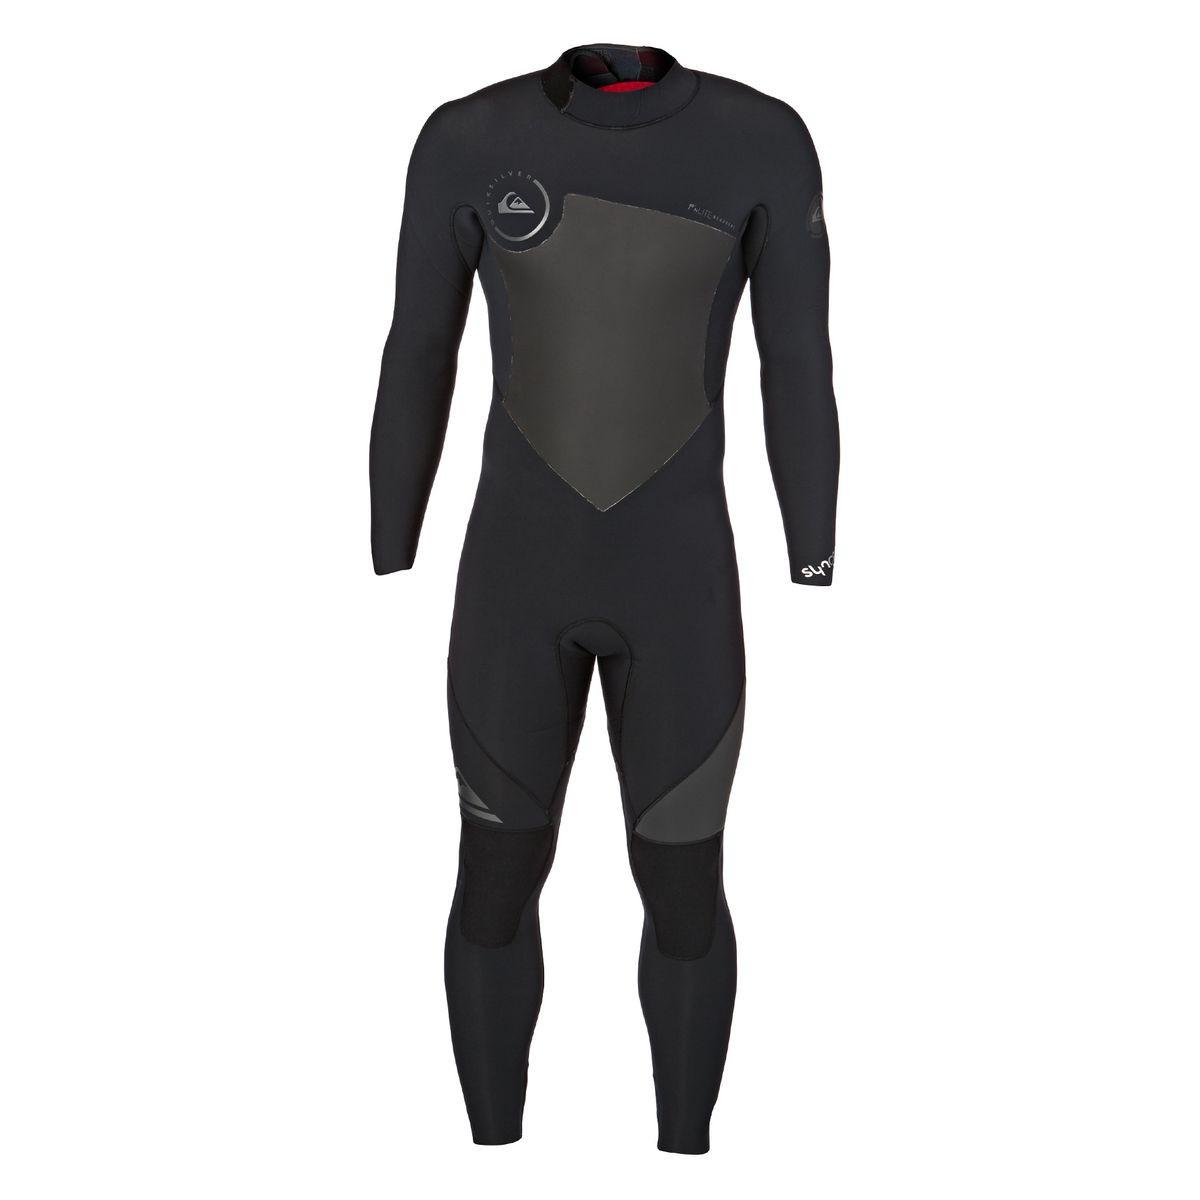 Quiksilver Syncro 5/4/3mm 2017 Back Zip Wetsuit - Black